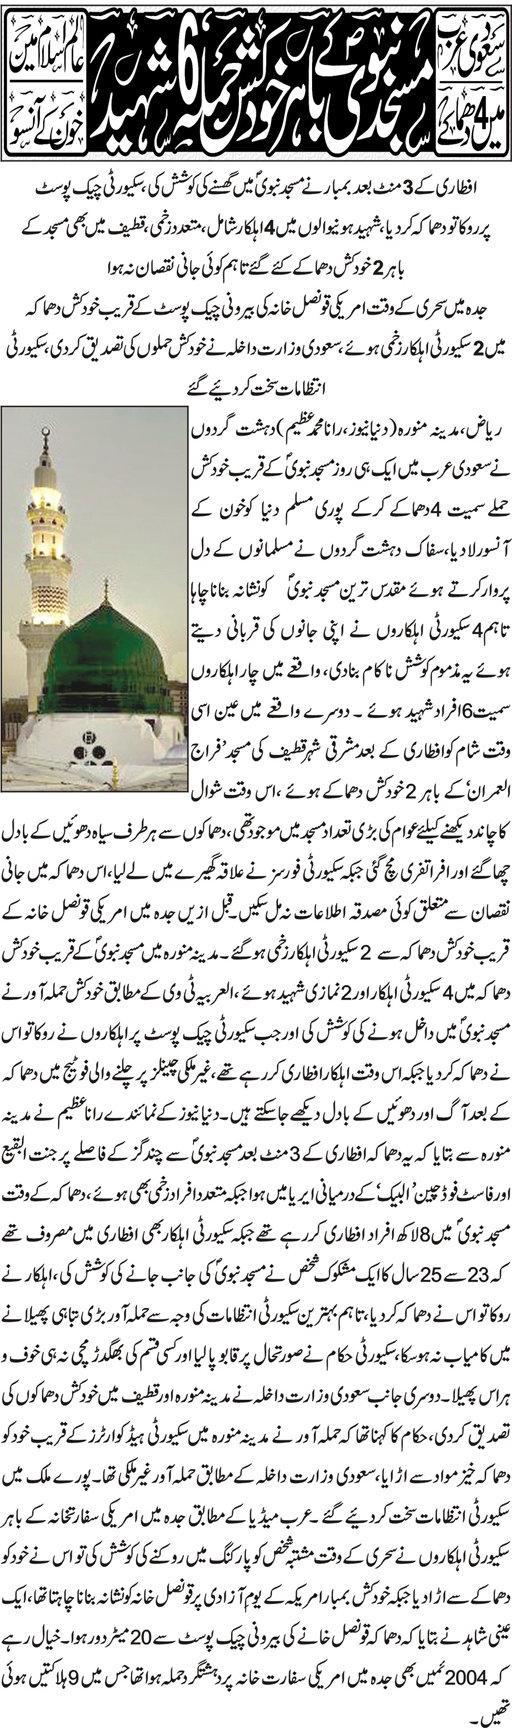 Suicide Bomb Blast at Madina Masjid i Nabvi